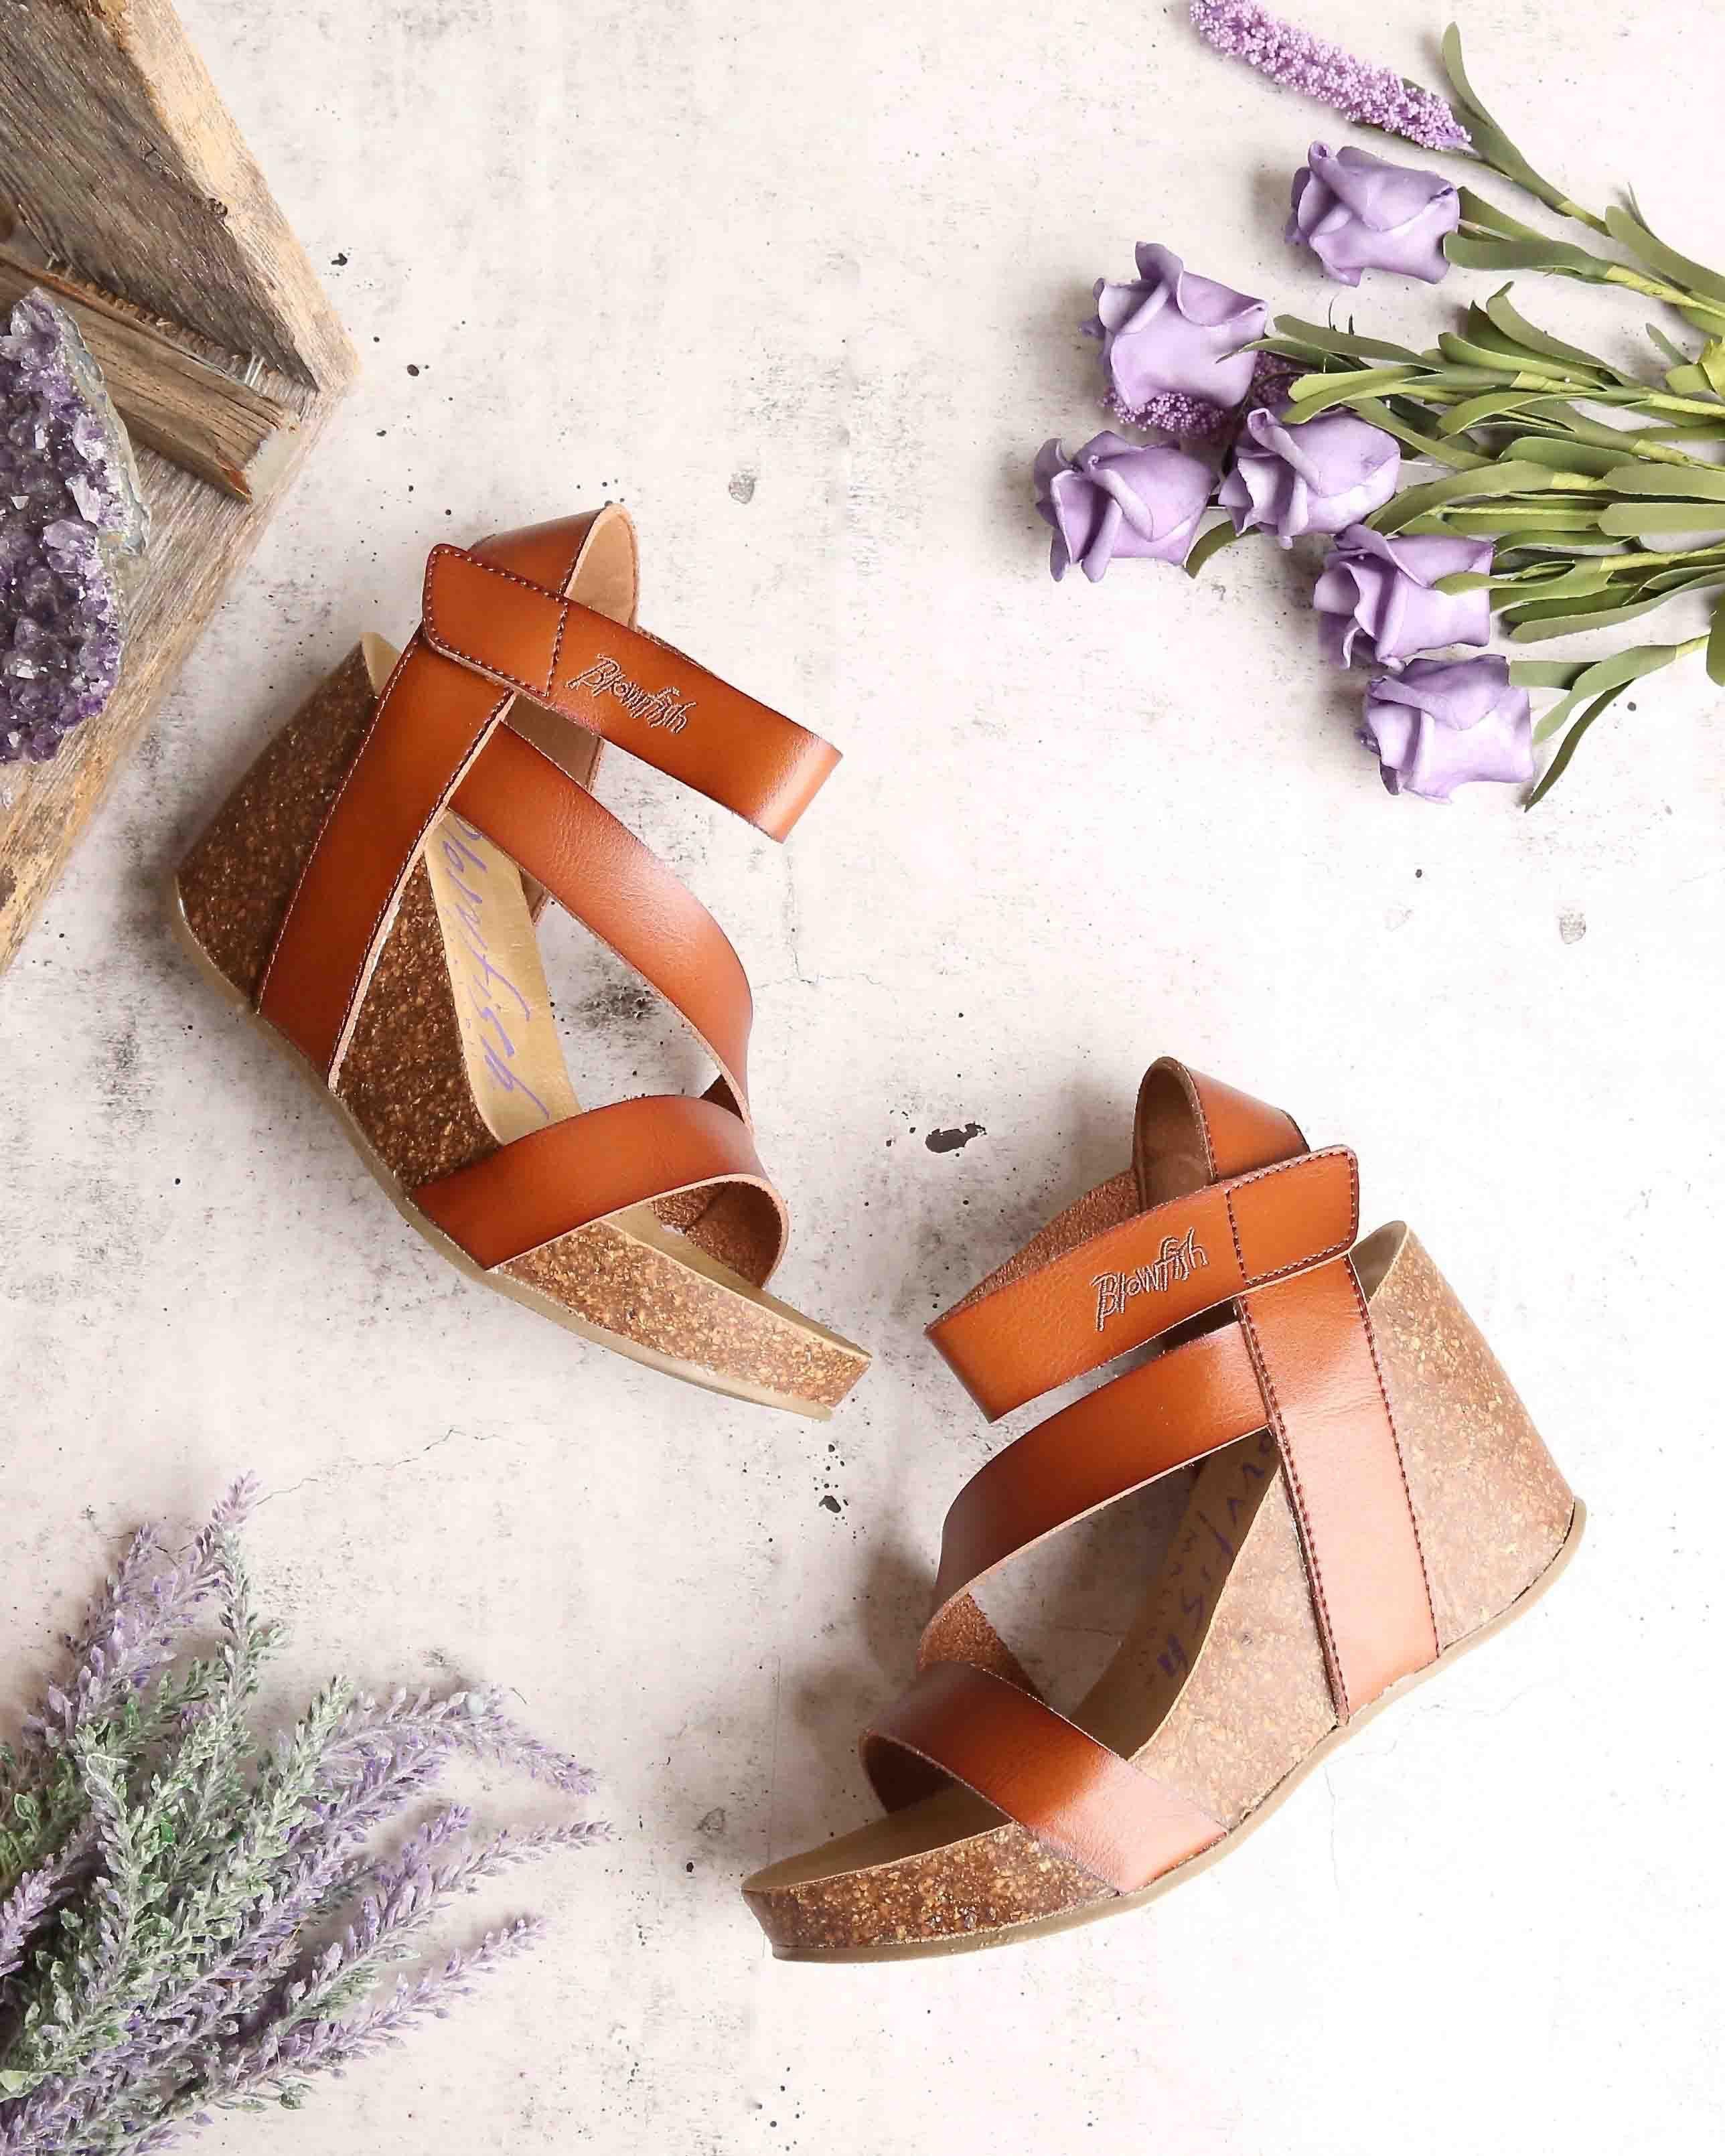 b3b7d21bb1 Blowfish - hapuku wedge sandal | Shoes | Wedge sandals, Wedges, Shoes